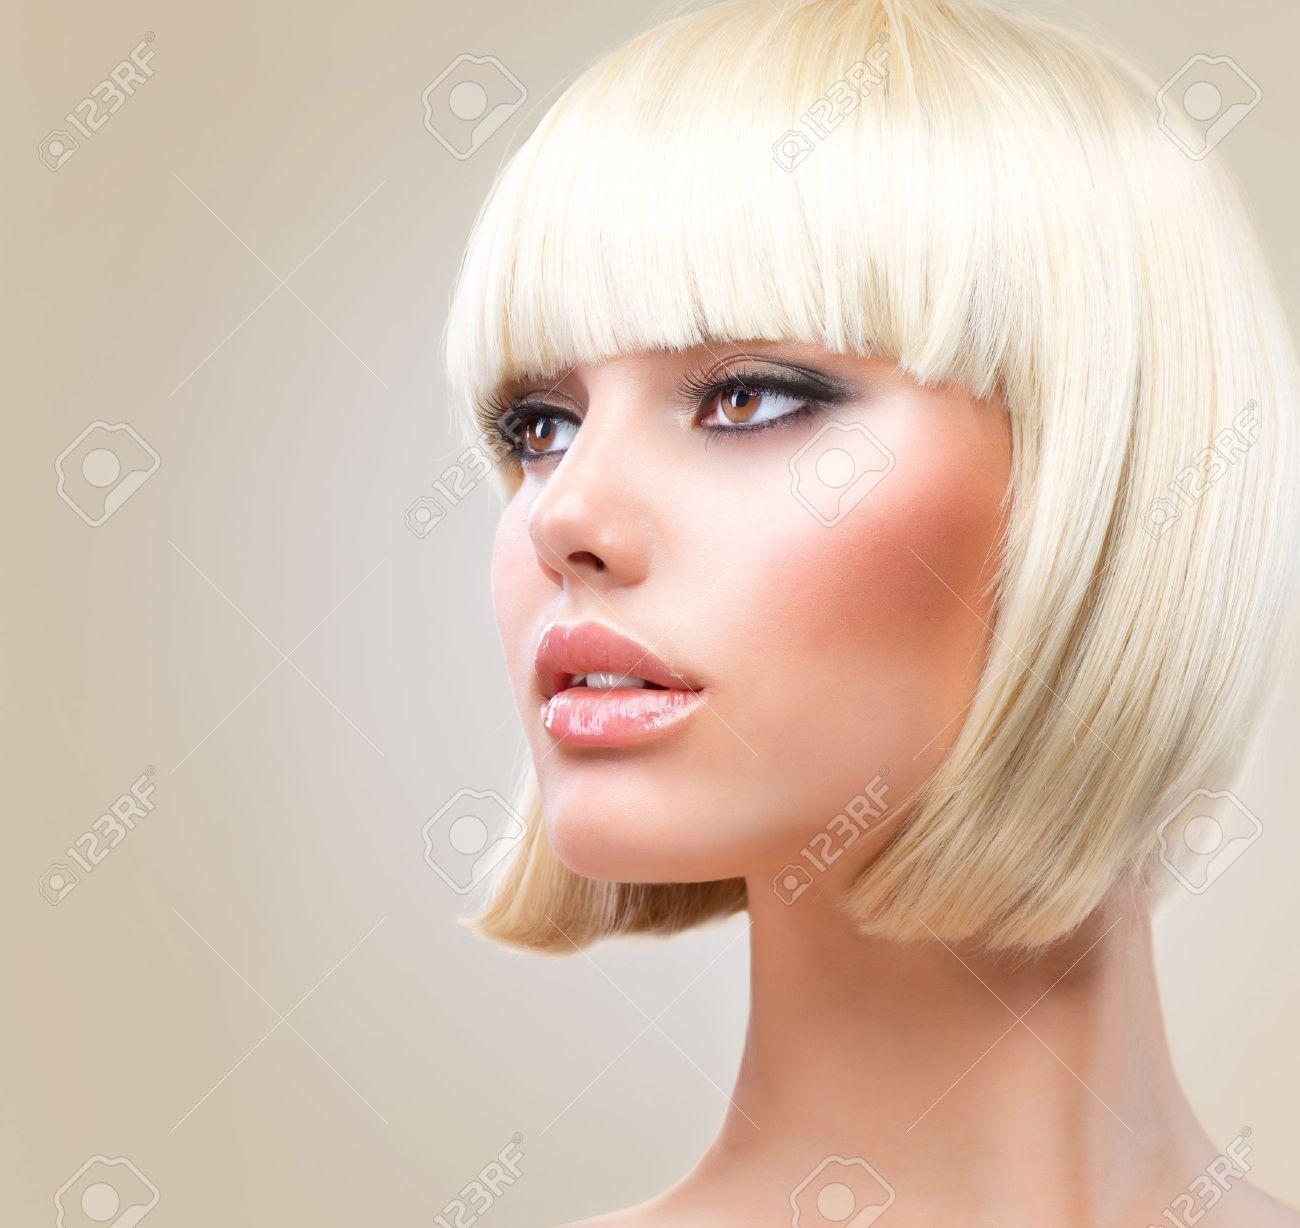 corte de pelo hermosa chica con el sano estilo de pelo corto pelo rubio foto de